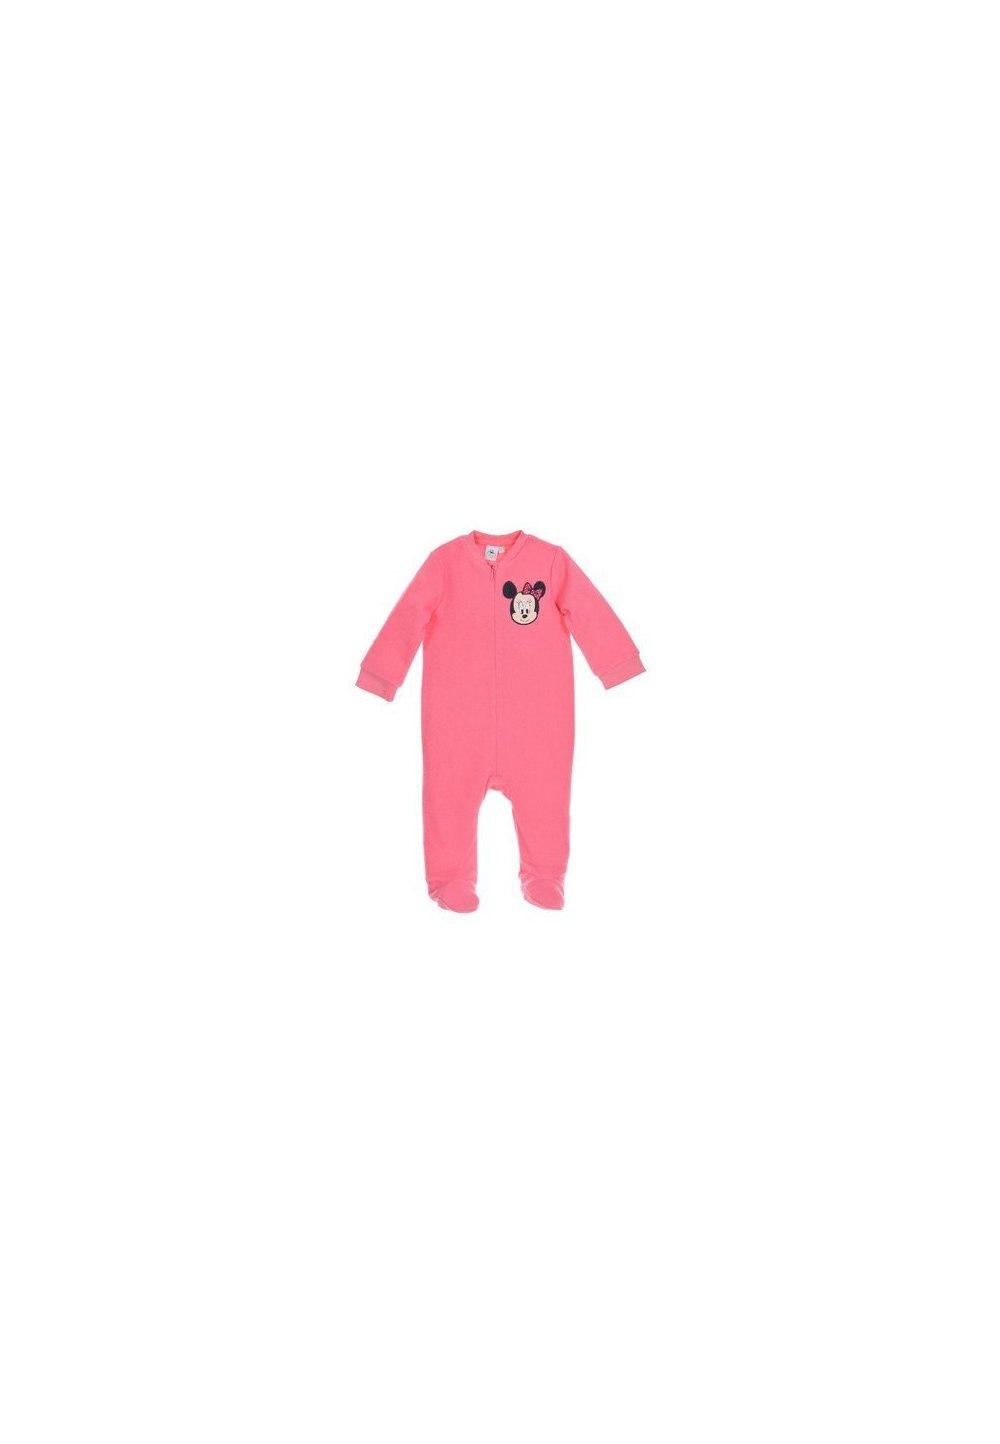 Salopeta fleece, roz deschis, Minnie imagine